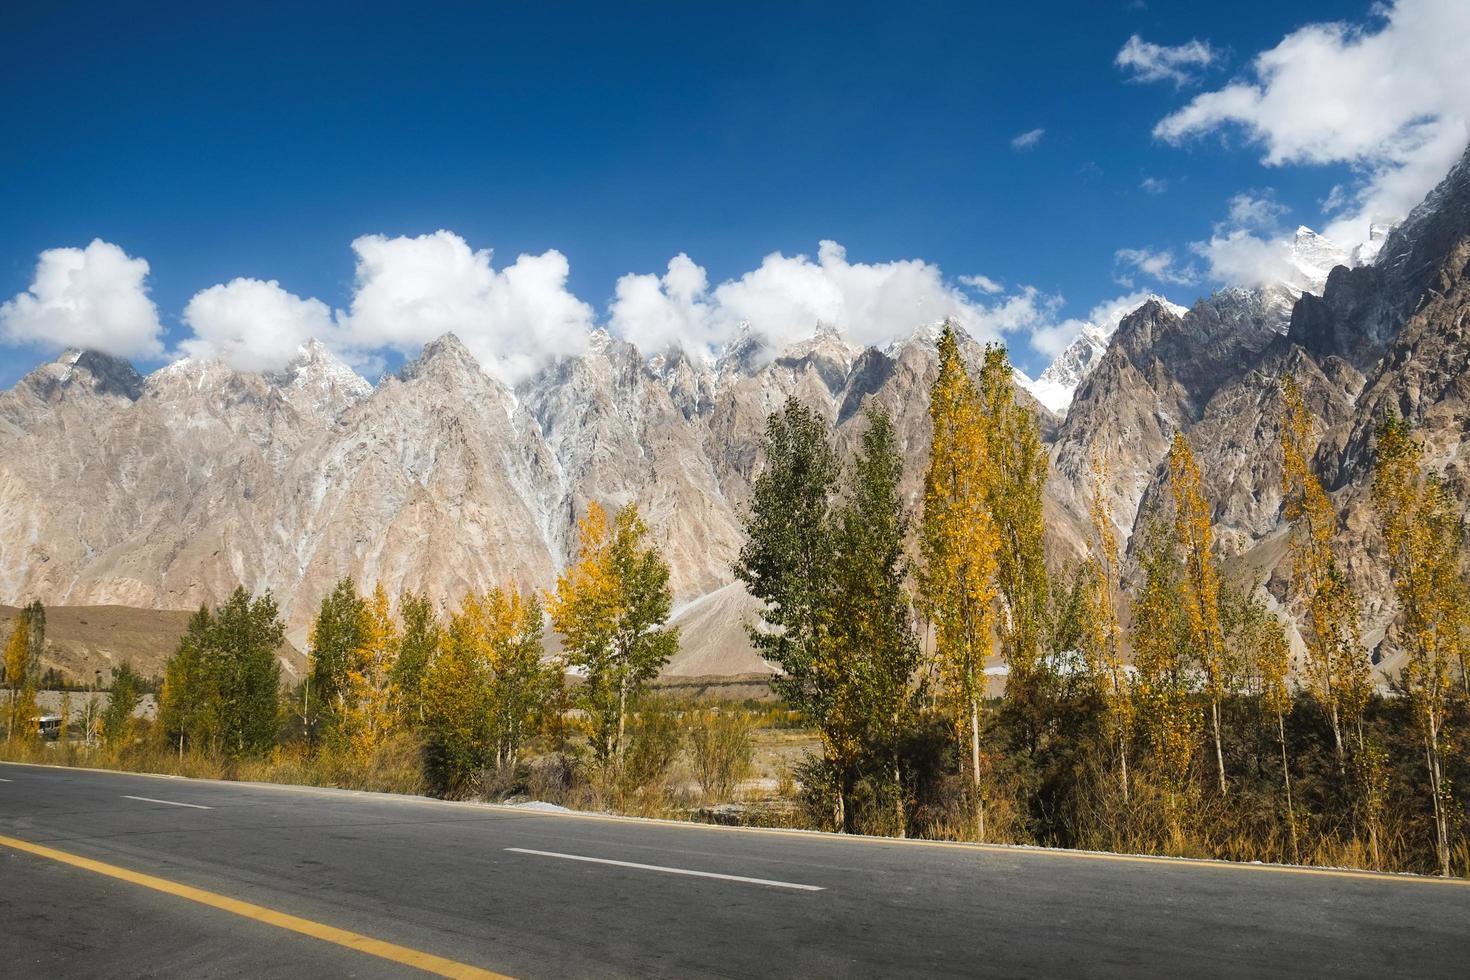 coni passu nella gamma karakoram, pakistan foto